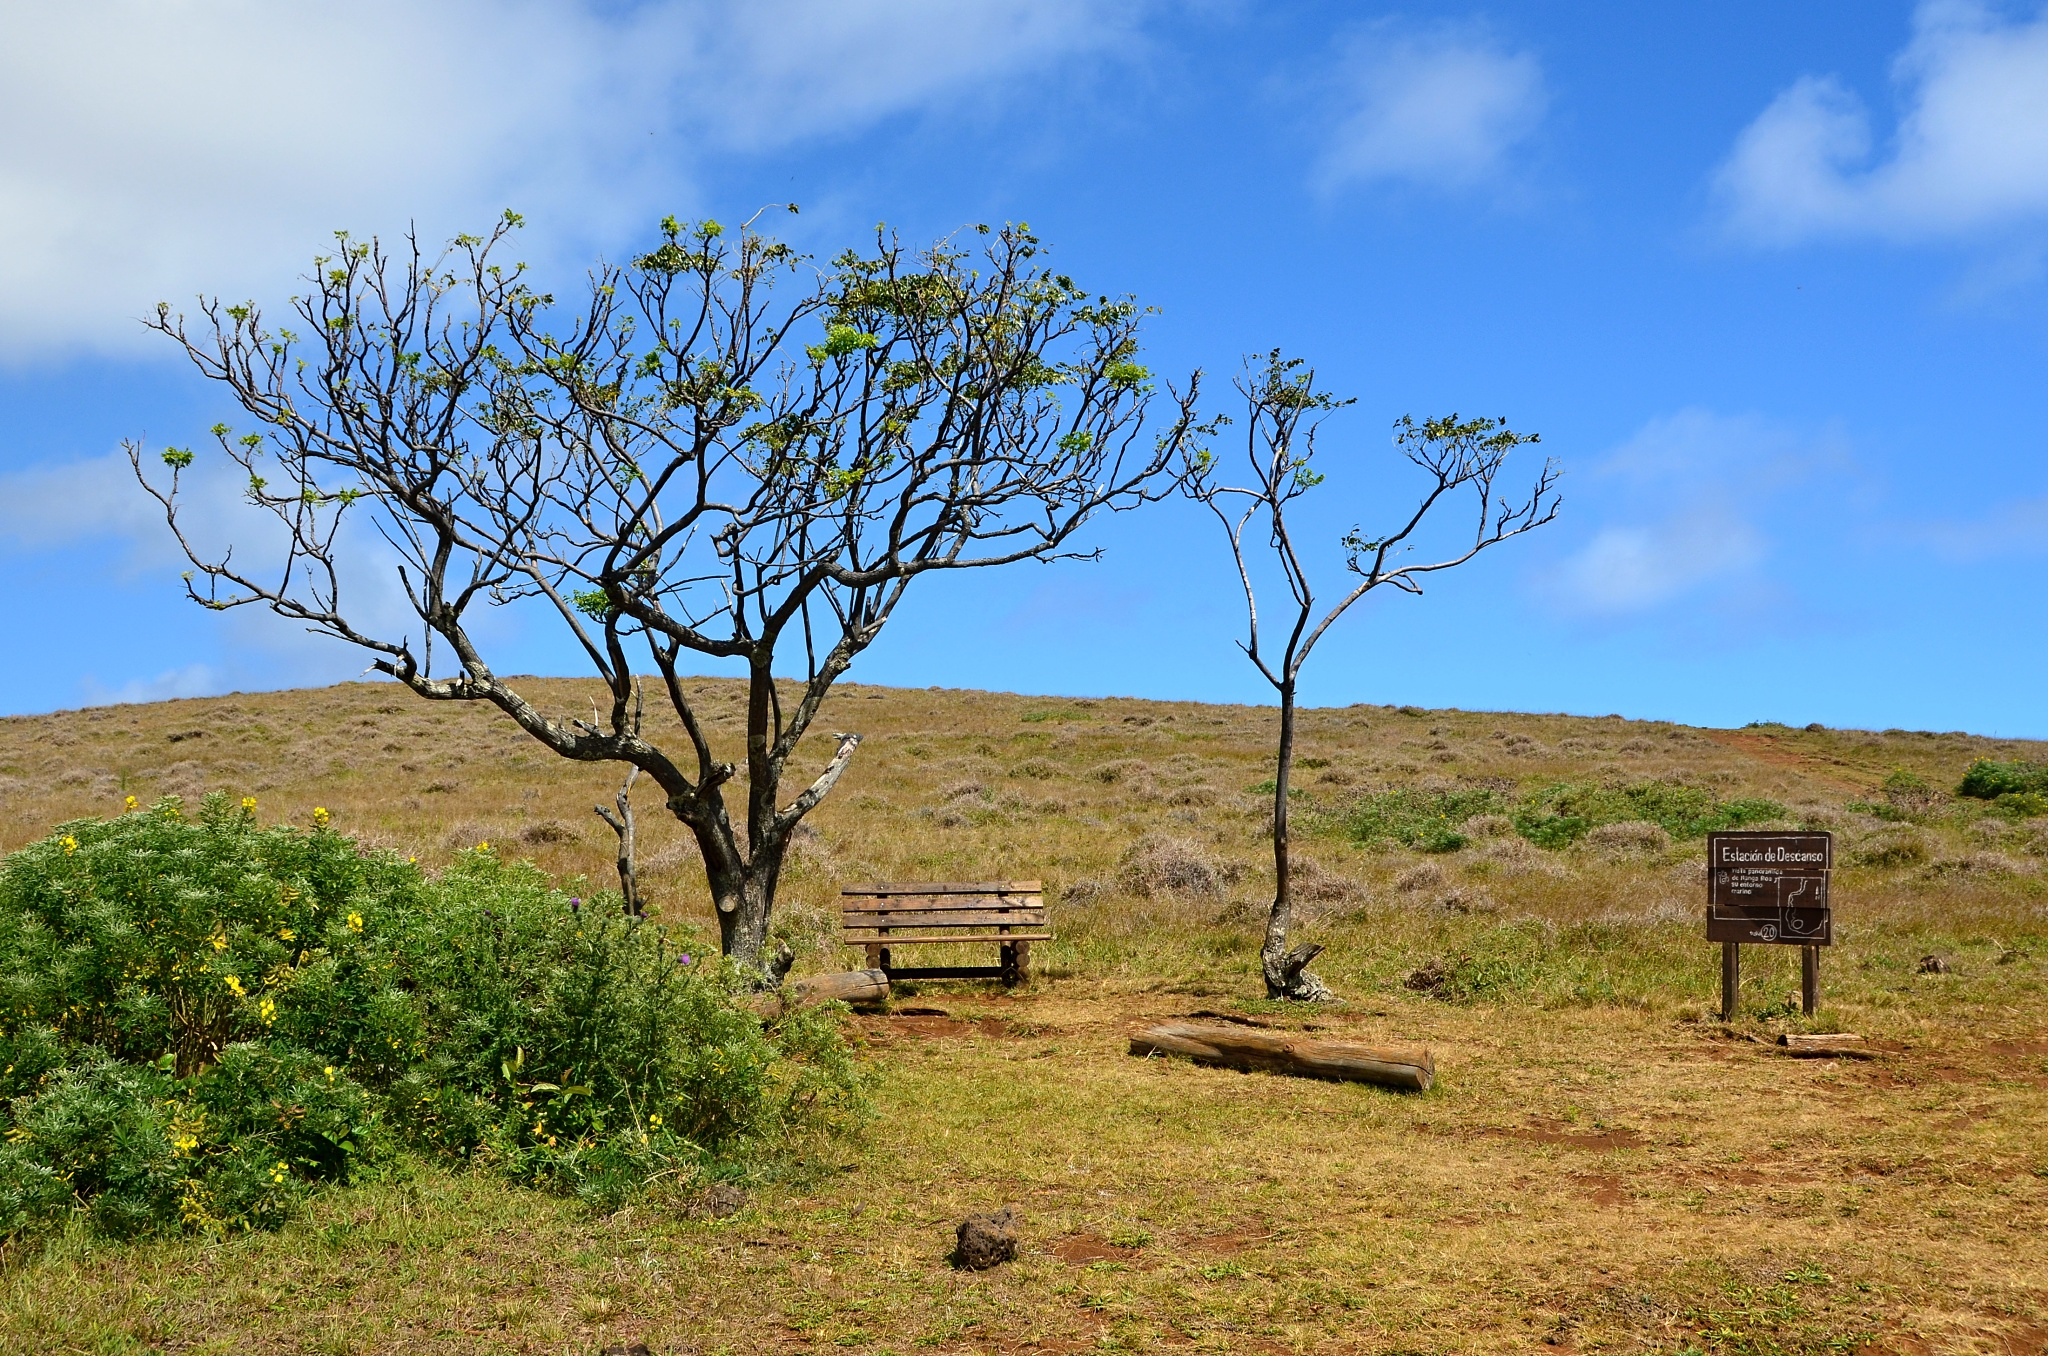 Odpočívadlo na cestě k vrcholu sopky Rano Kau